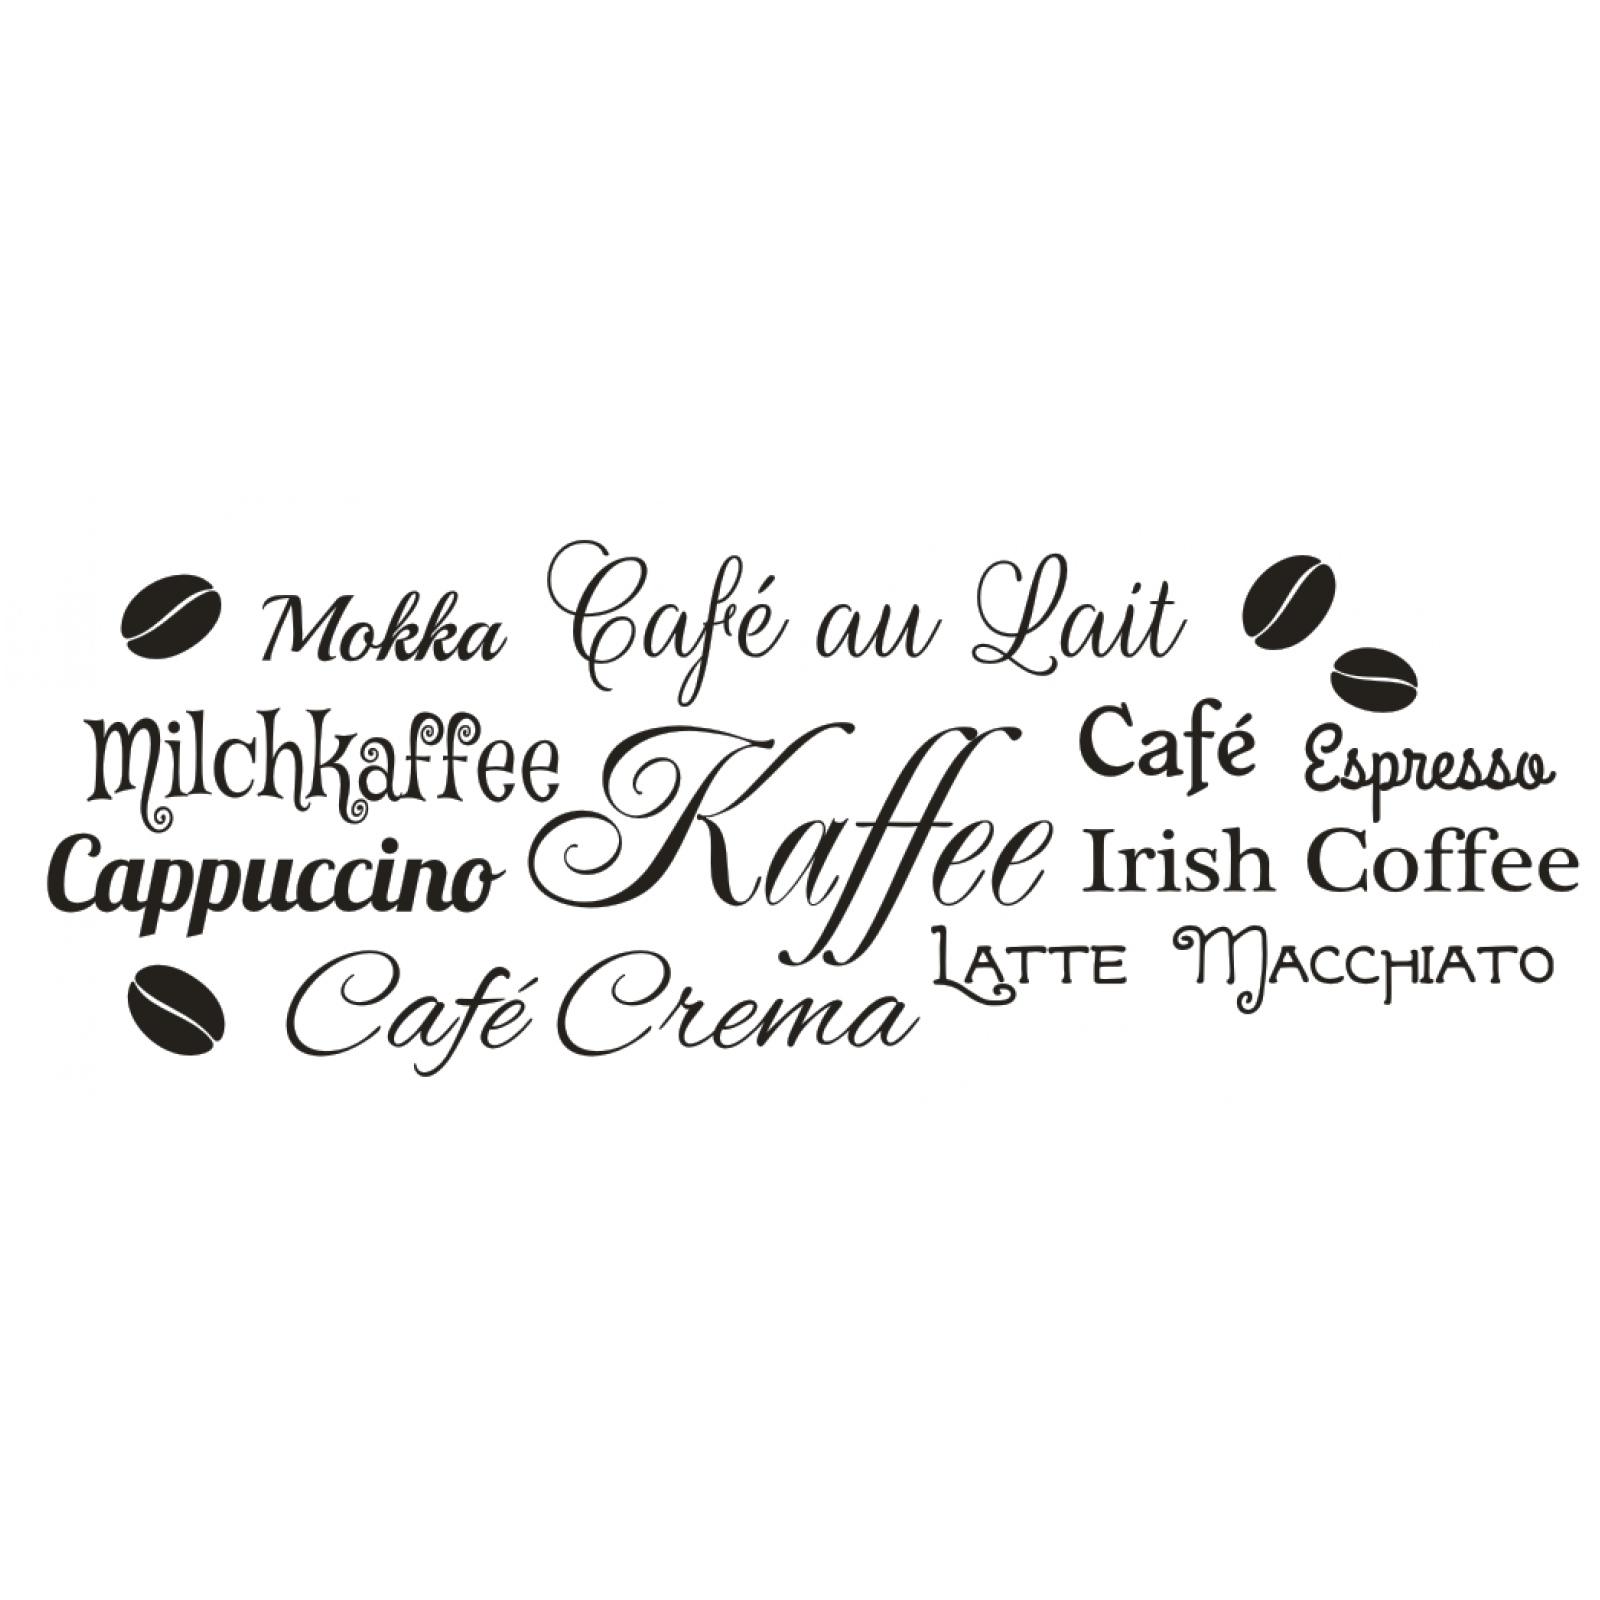 Erstaunlich Kaffee U2013 Latte Macchiato, Milchkaffee, Cappuccino,  Espresso, Café Au Lait,